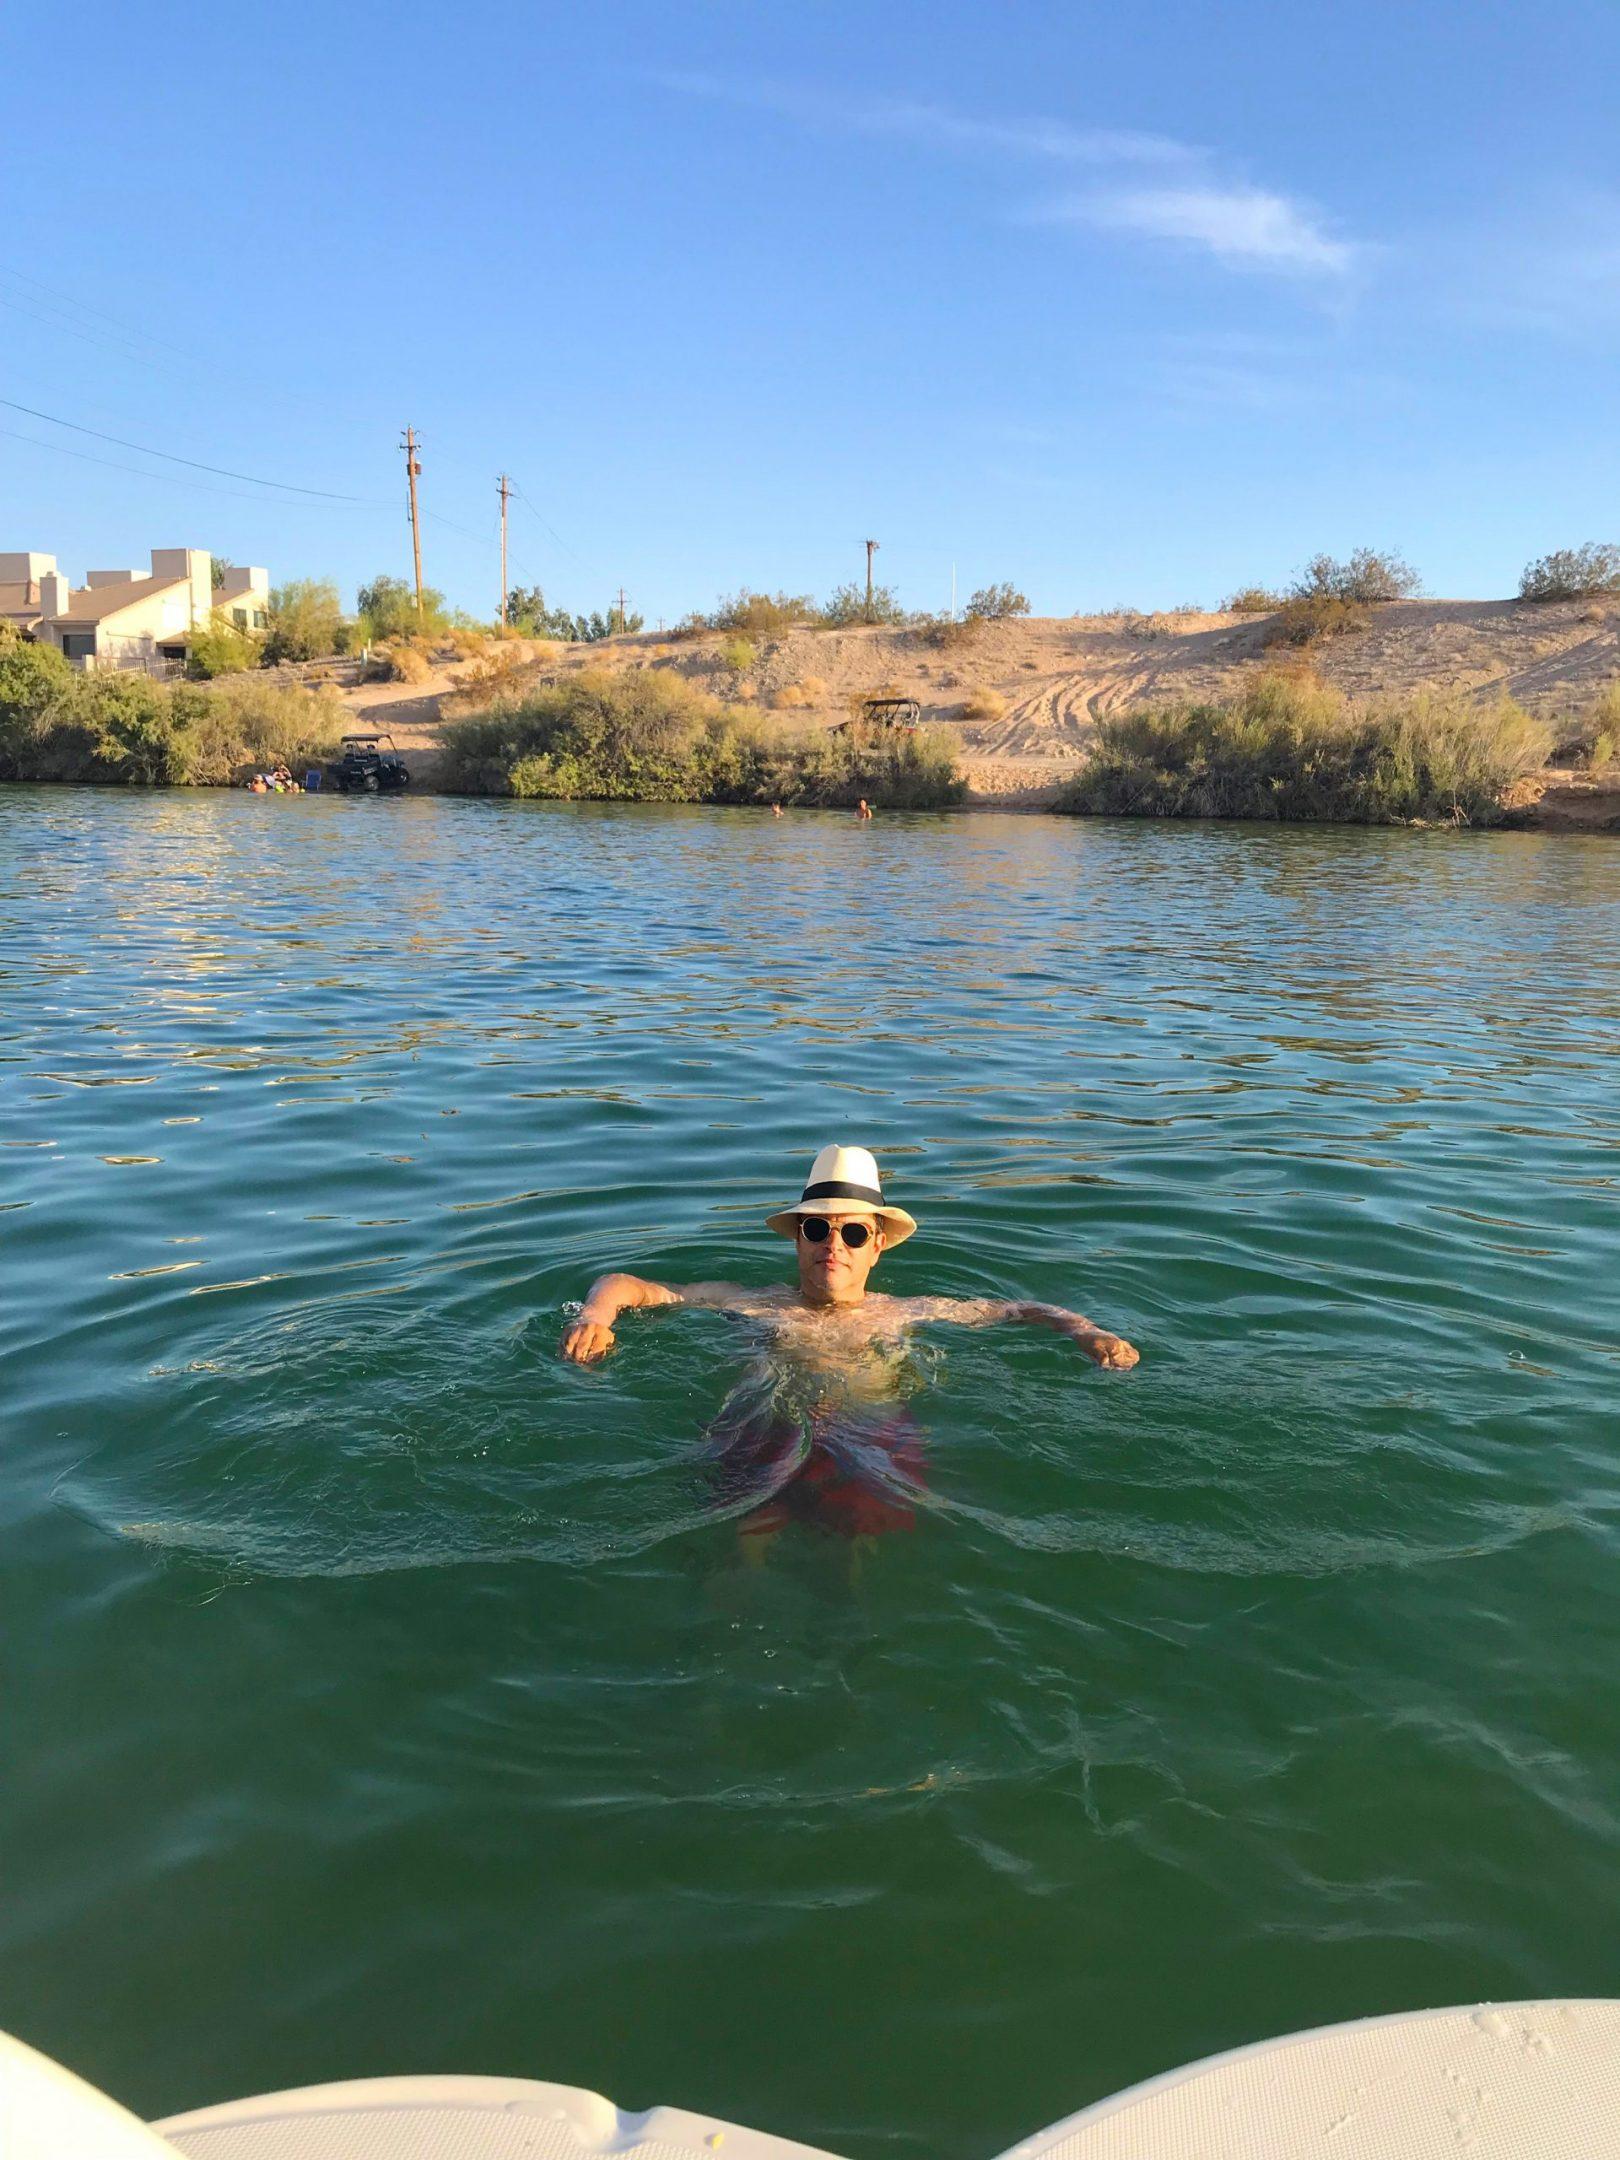 Douglas taking a dip on Lake Havasu